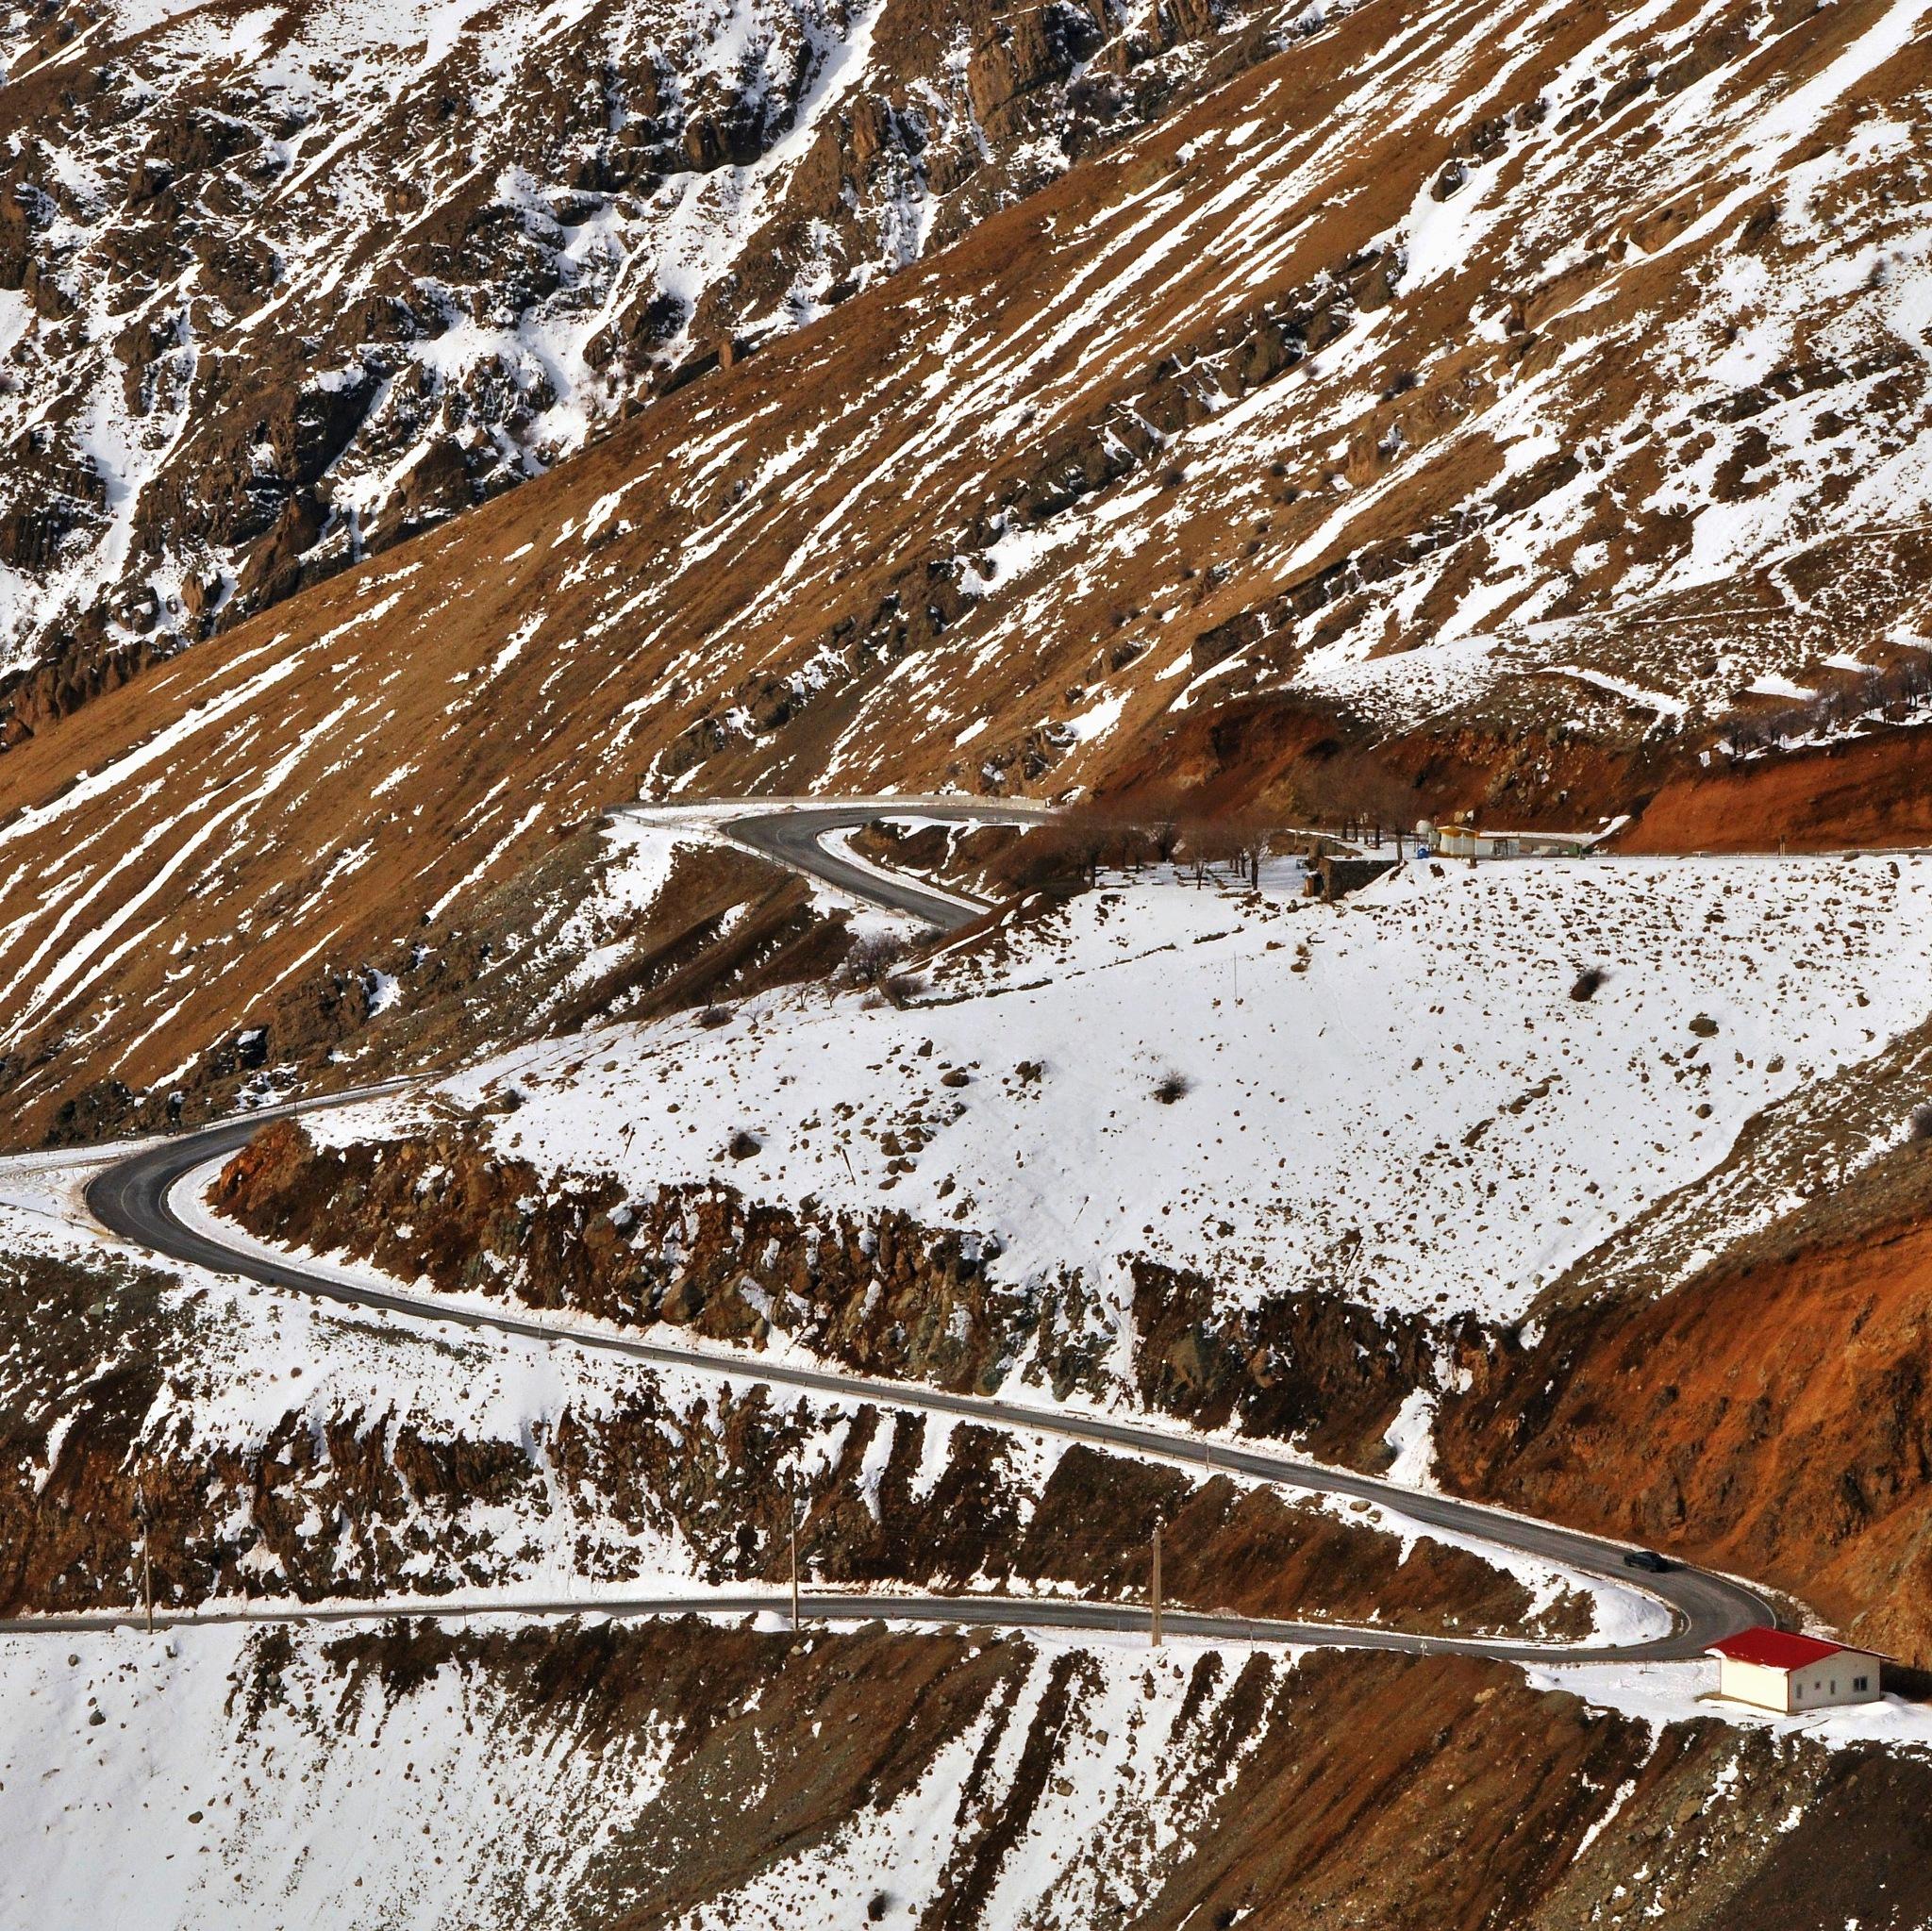 THE ROAD by Shahdad Farsadfar